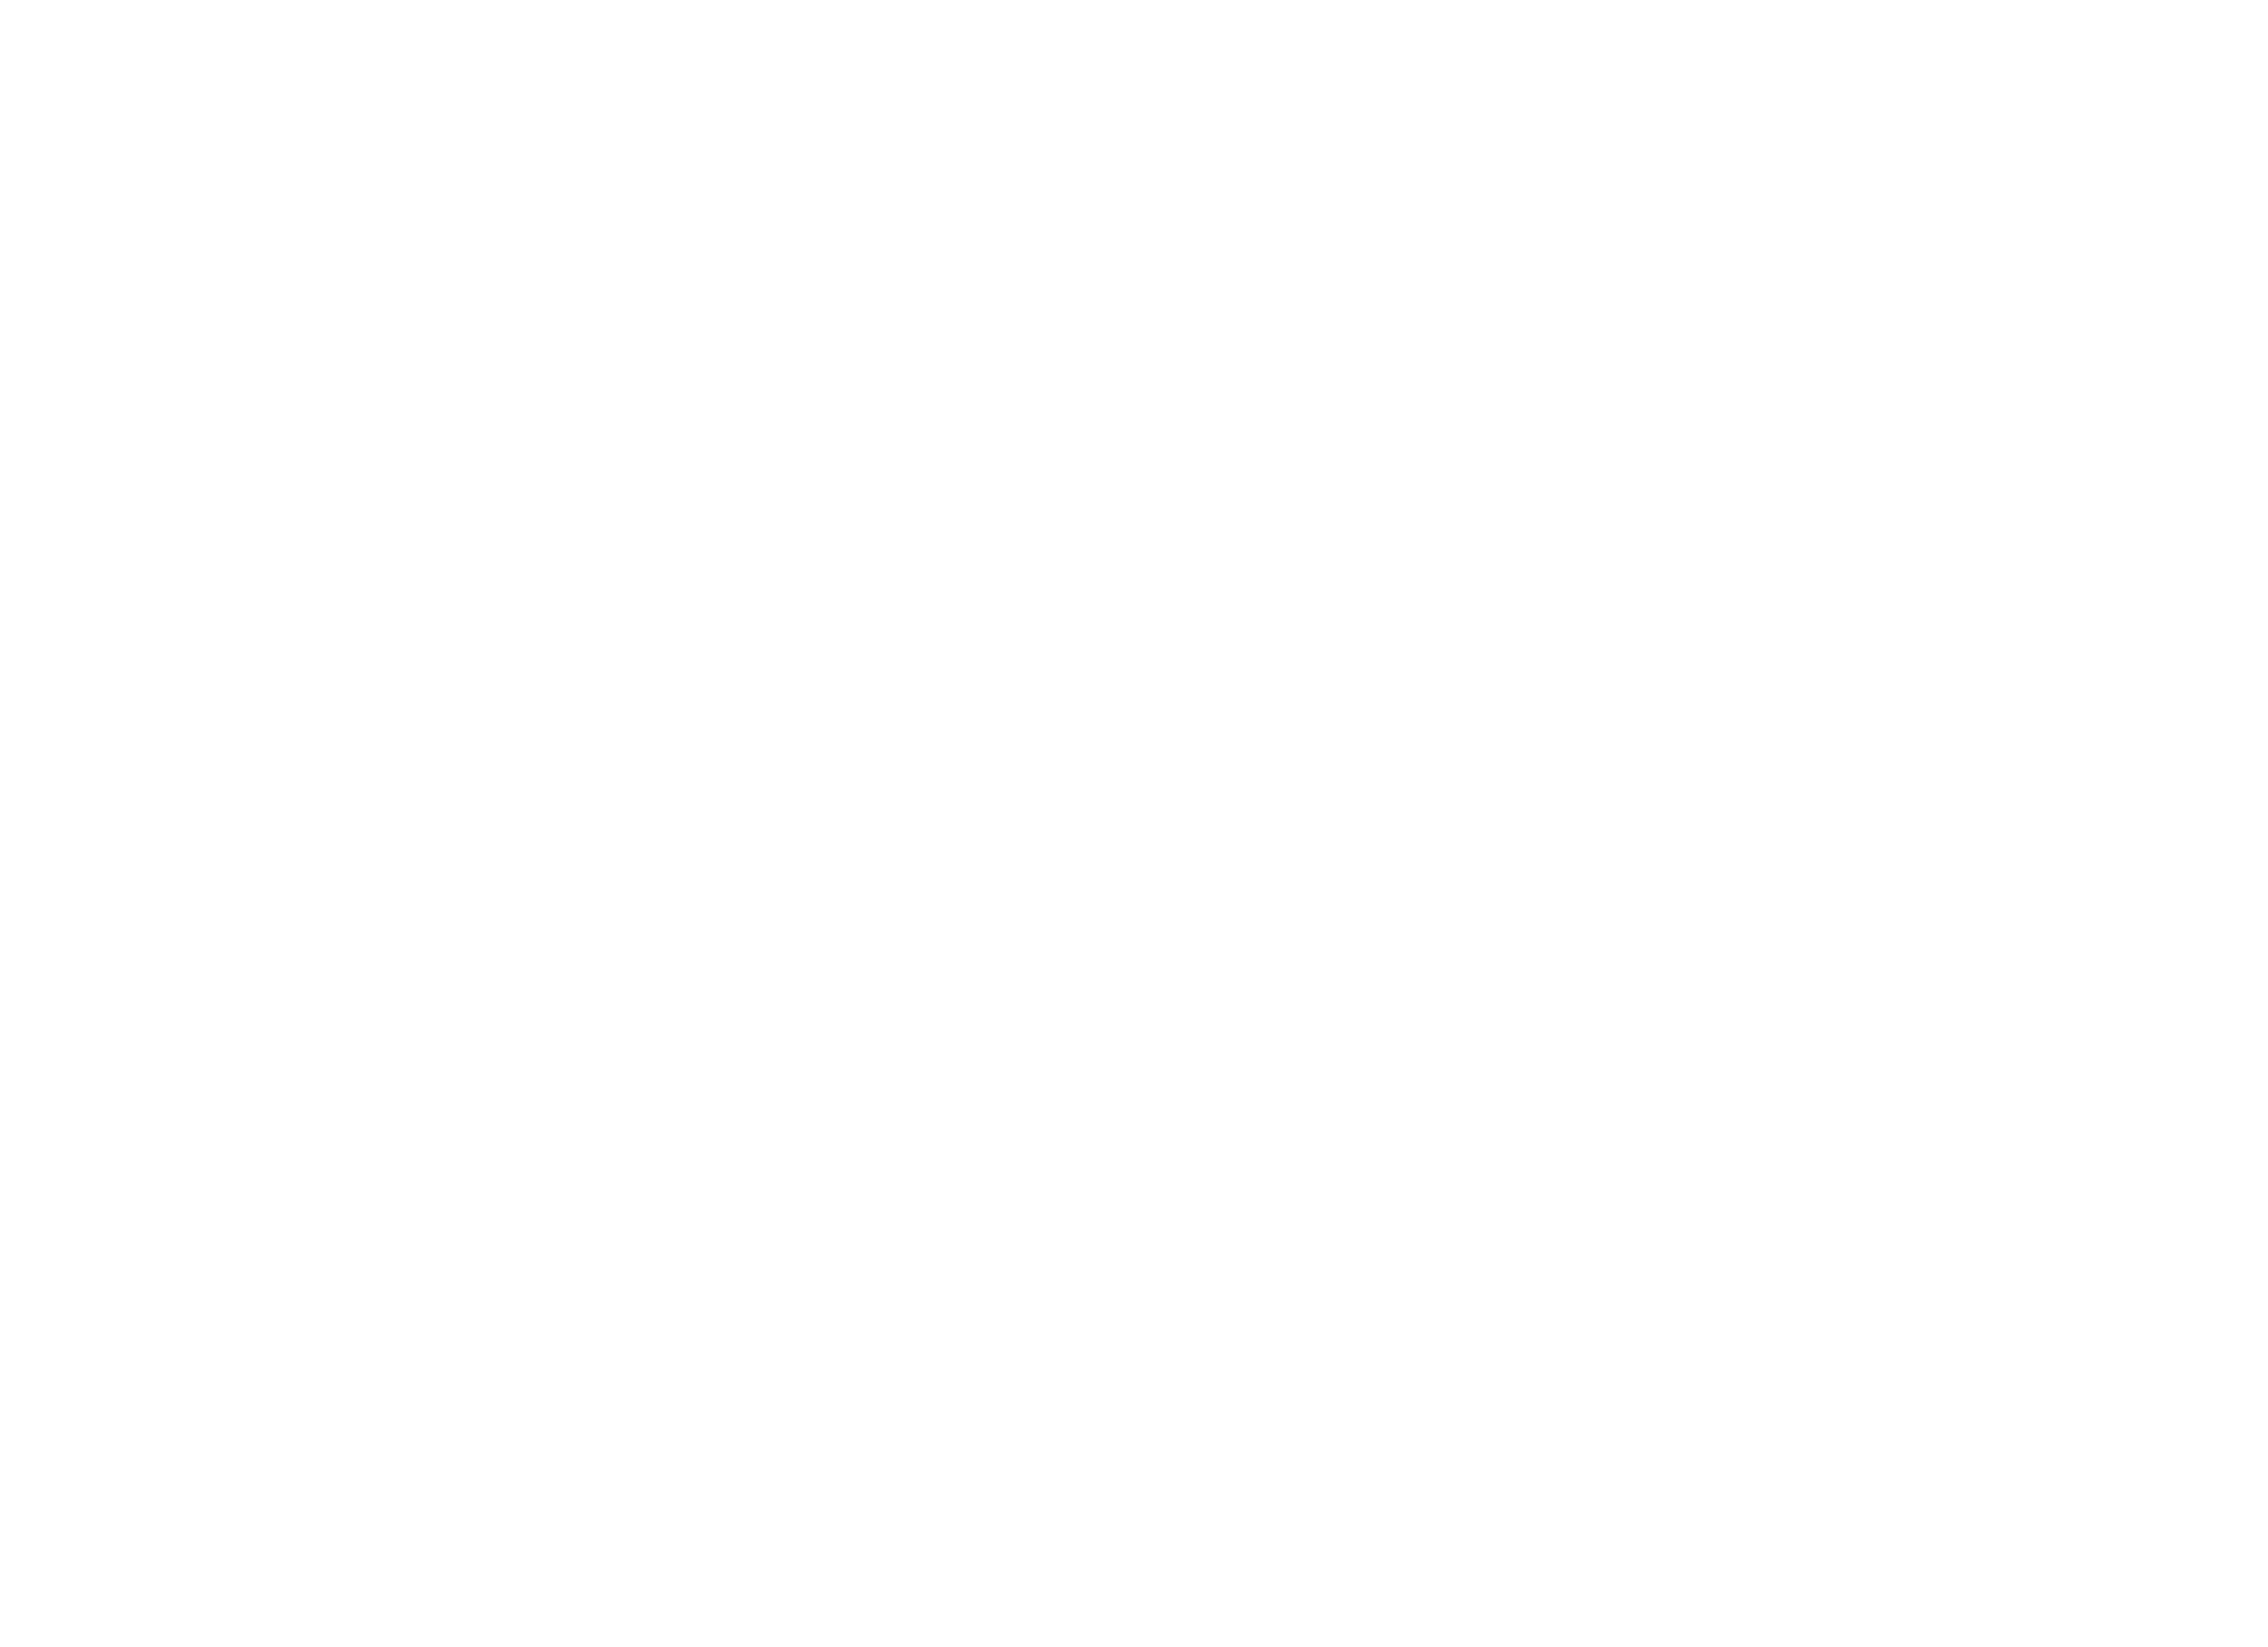 LOGO_FOODZONE copia 2